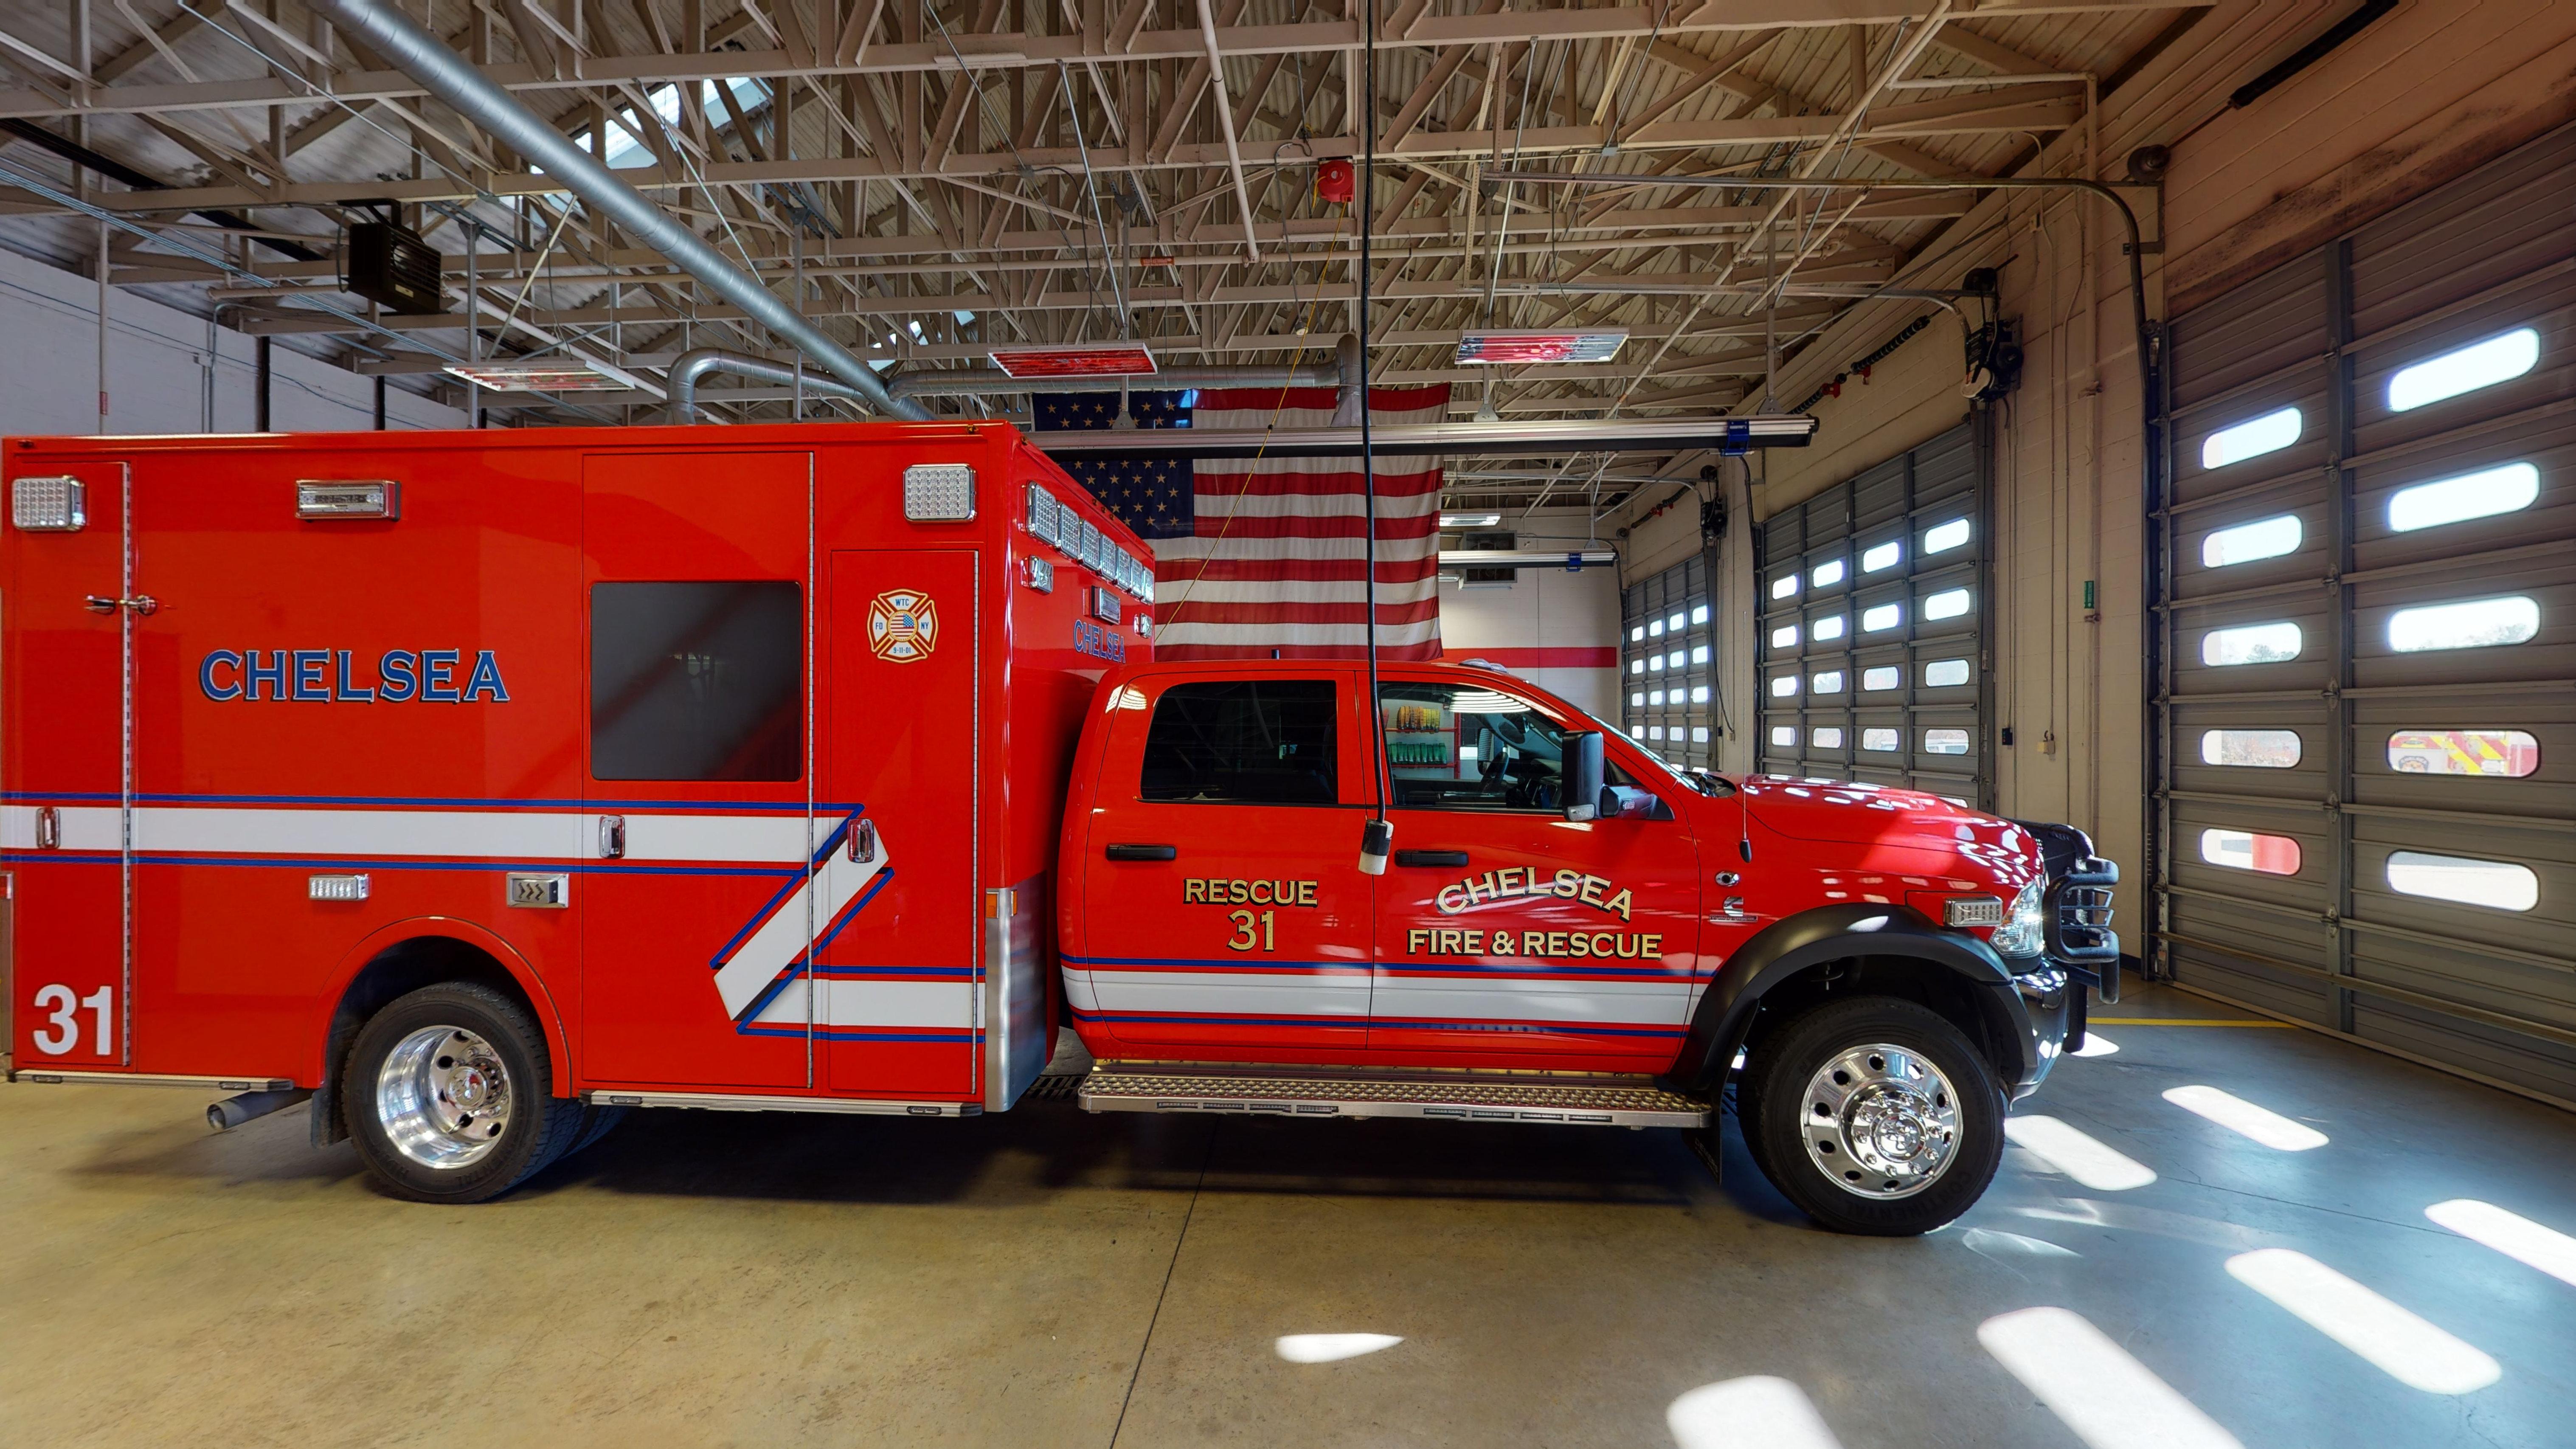 5_Chelsea-Fire-Rescue-Demers-151-06162021_101113